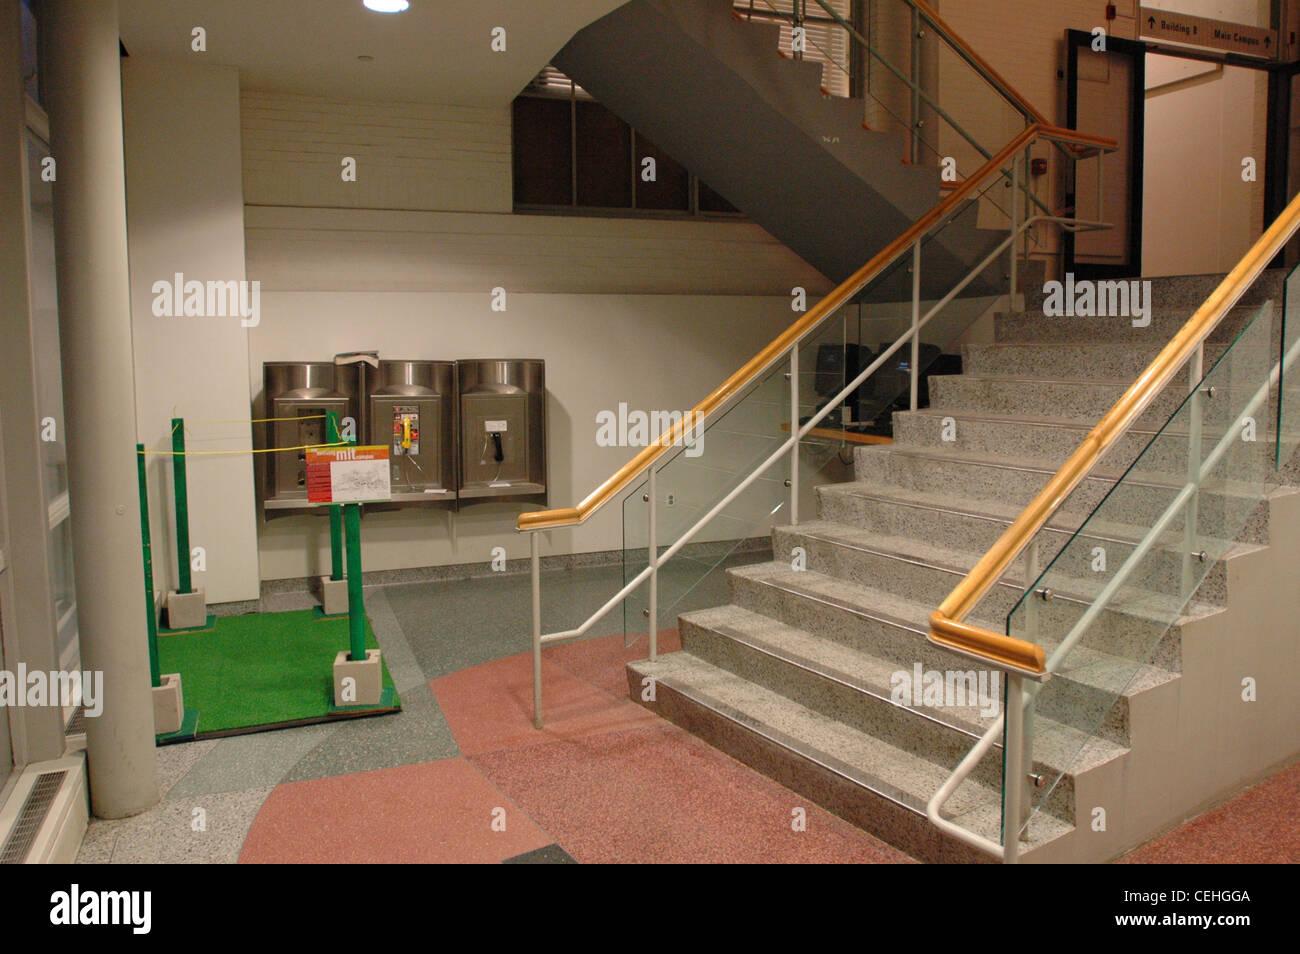 Evolving/Devolving Campus Greenspace Hack at MIT, 2006 - Stock Image